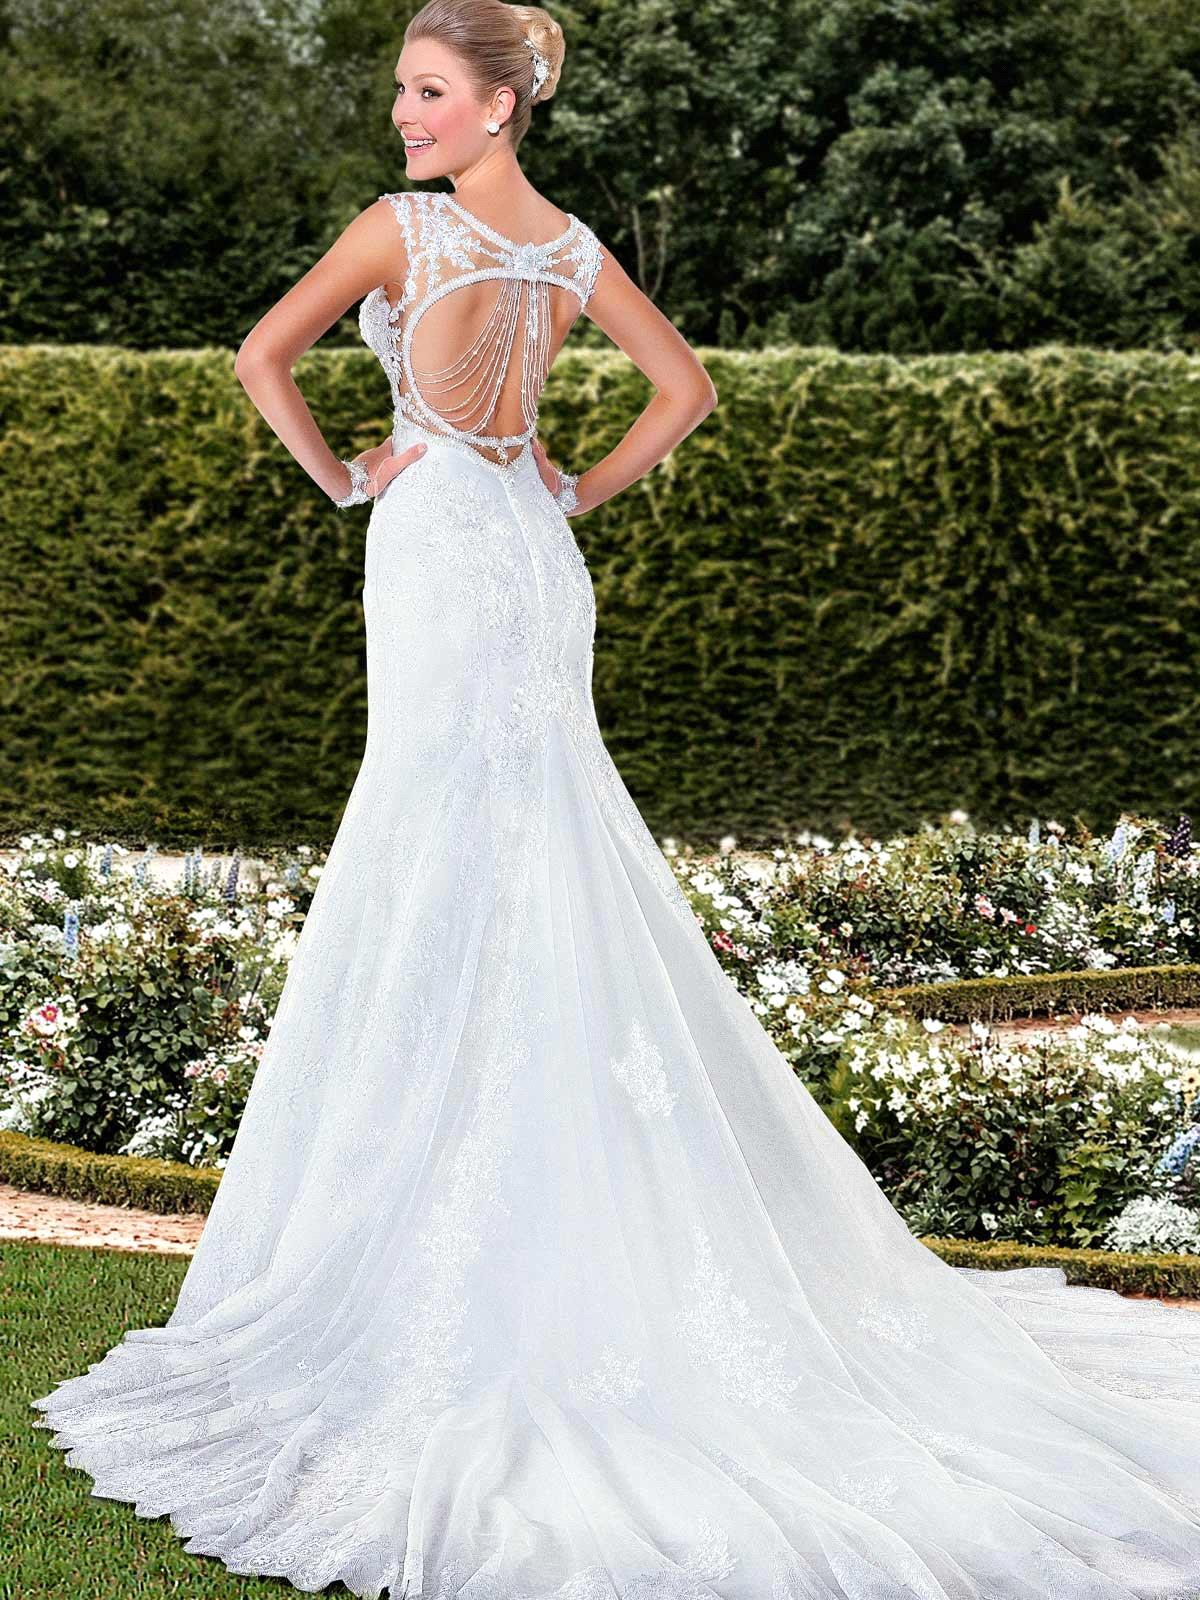 Sereia 2016 Sexy Backless sirène robes De mariée élégante dentelle ...